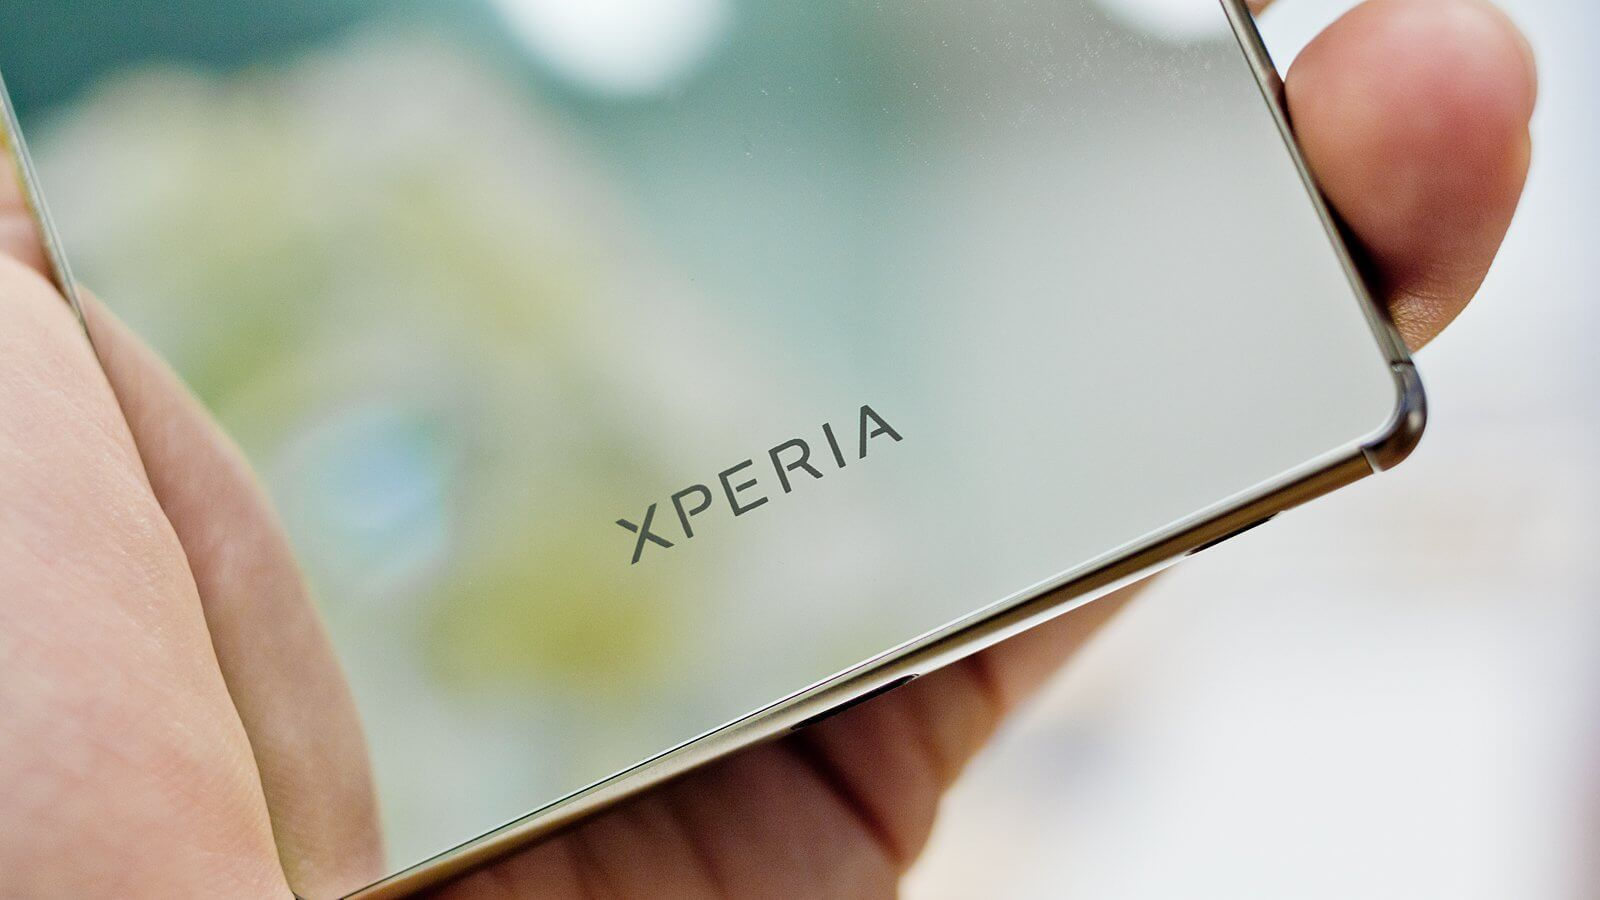 Прощайте, рамки: в Сети появился рендер Sony Xperia C6